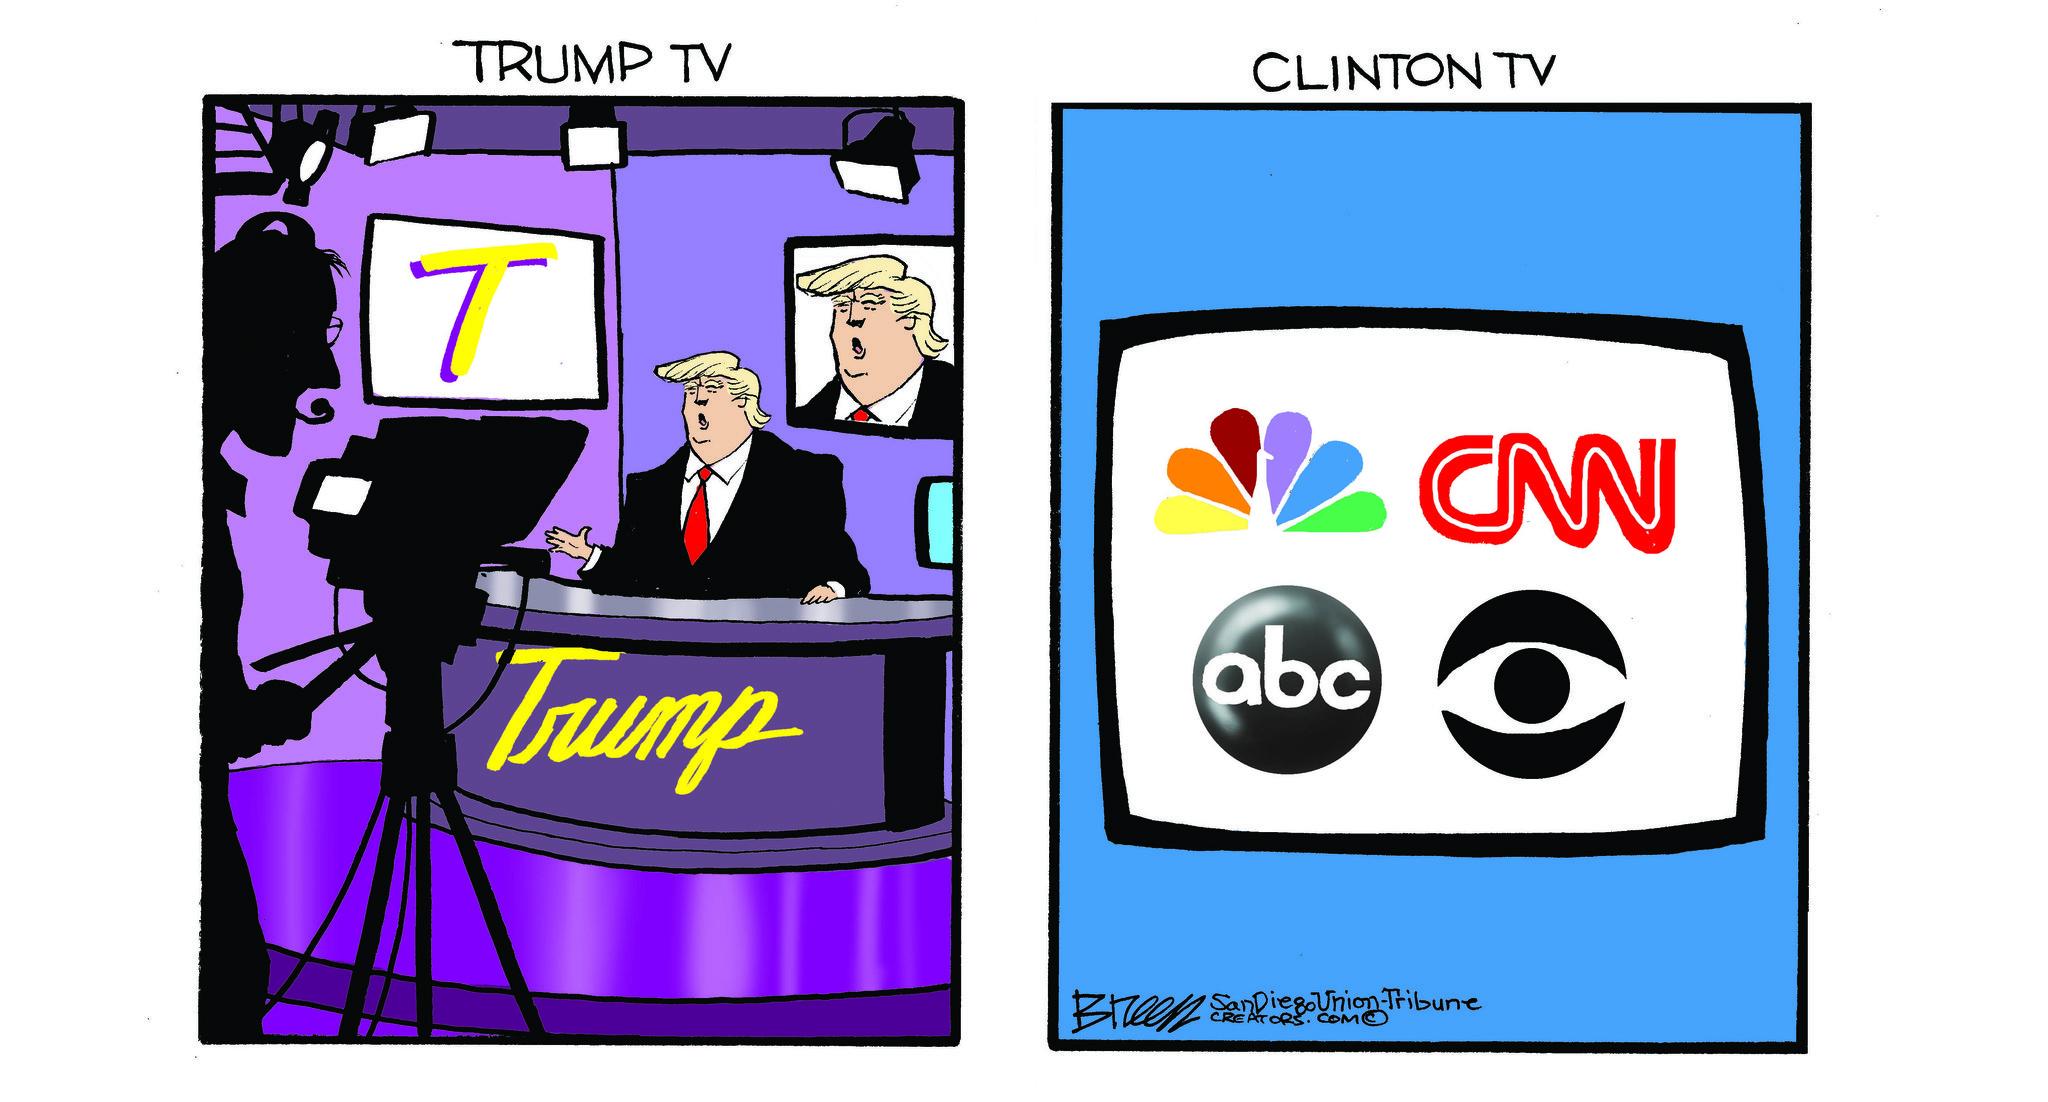 sdut-trump-tv-in-the-works-10-30-16-20161028